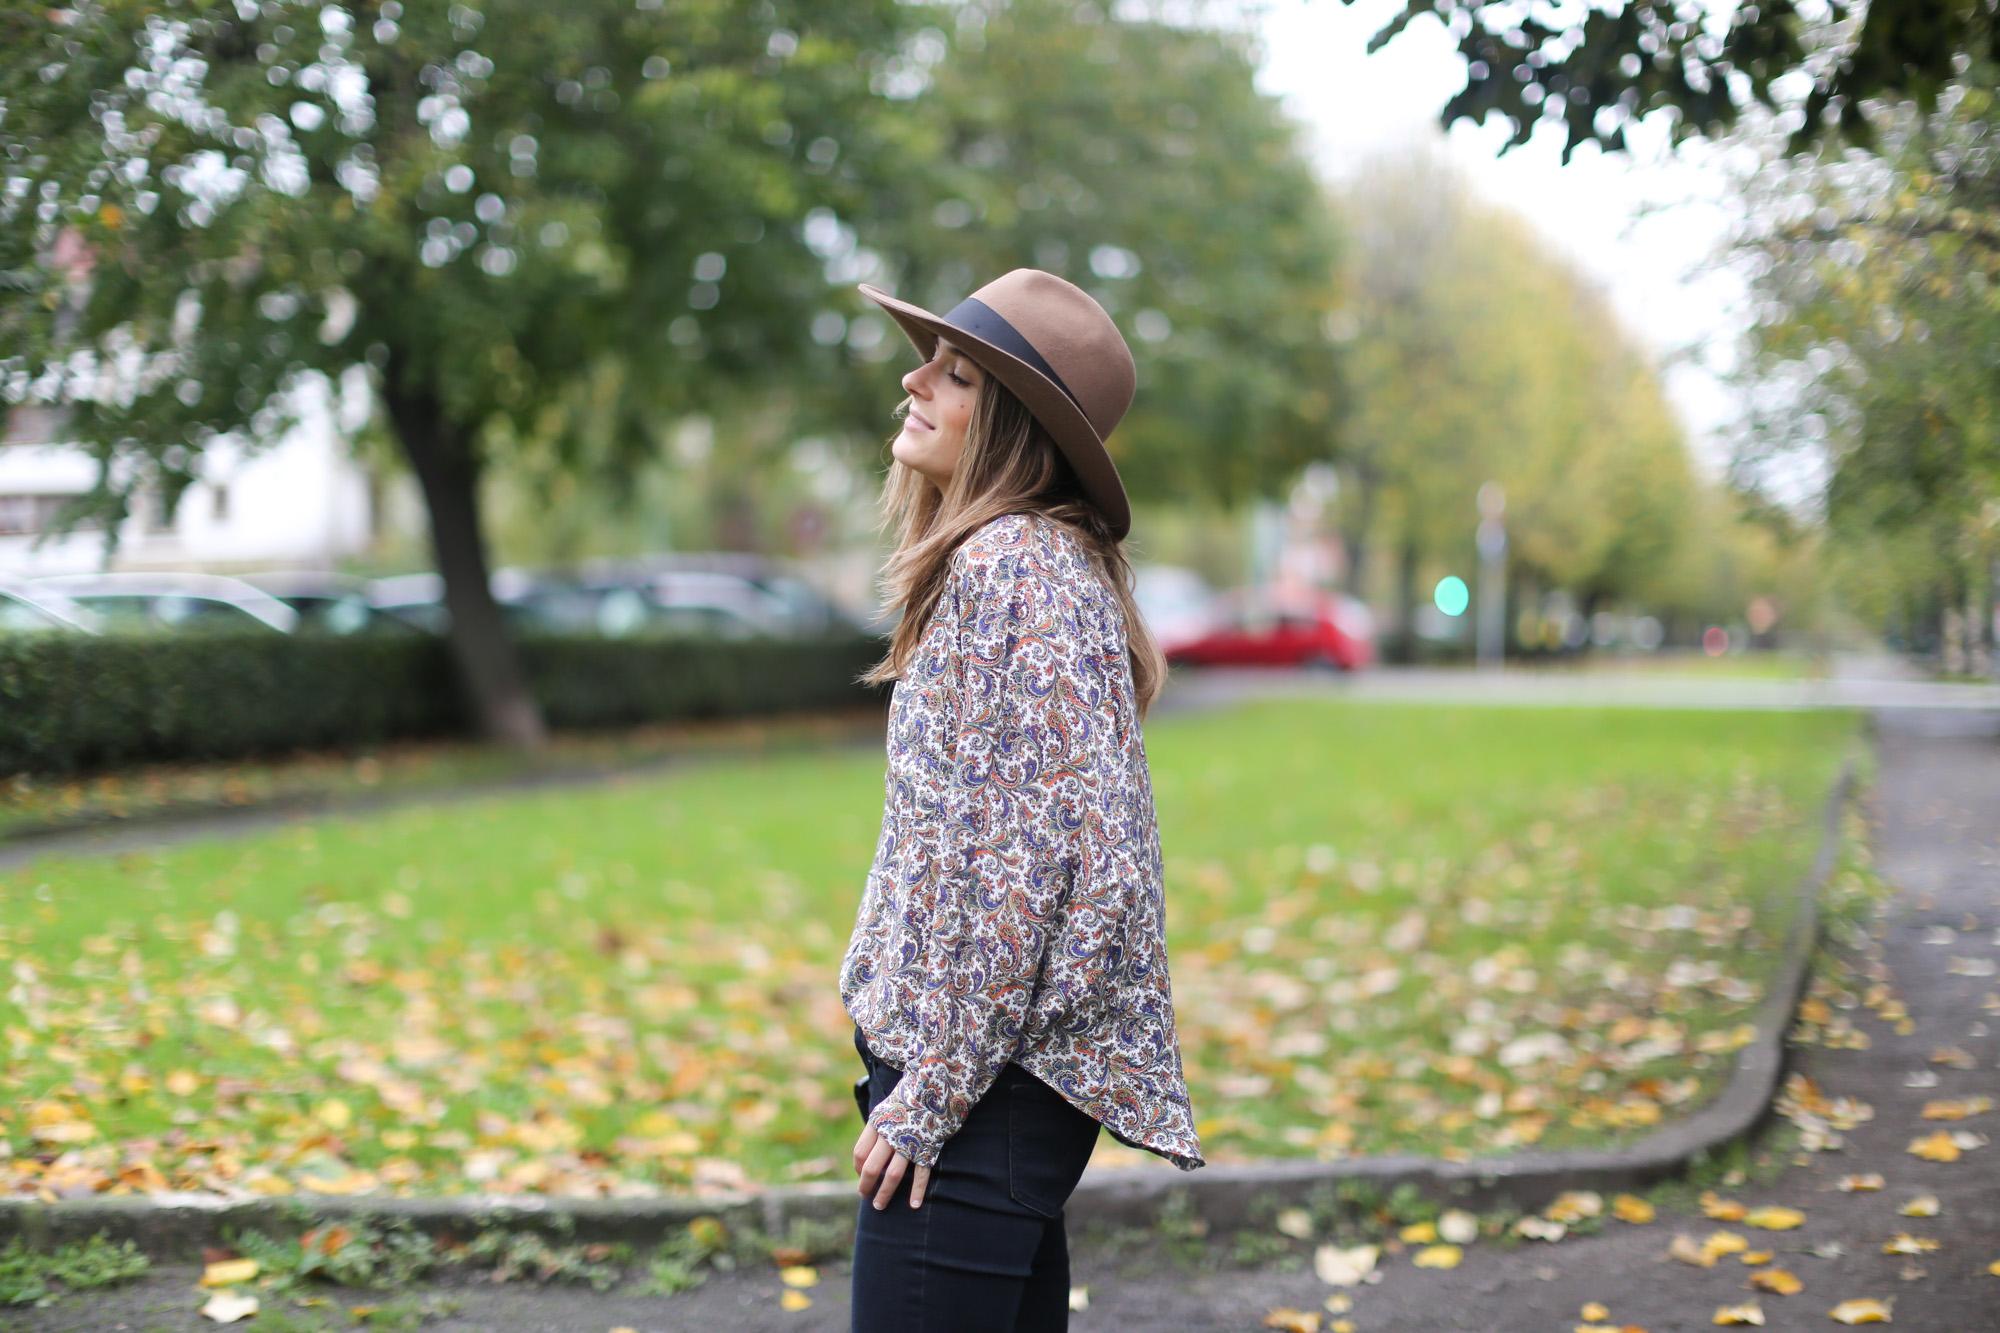 Clochet-streetstyle-fedora-hat-suiteblanco-paisley-shirt-cowboy-boots-8